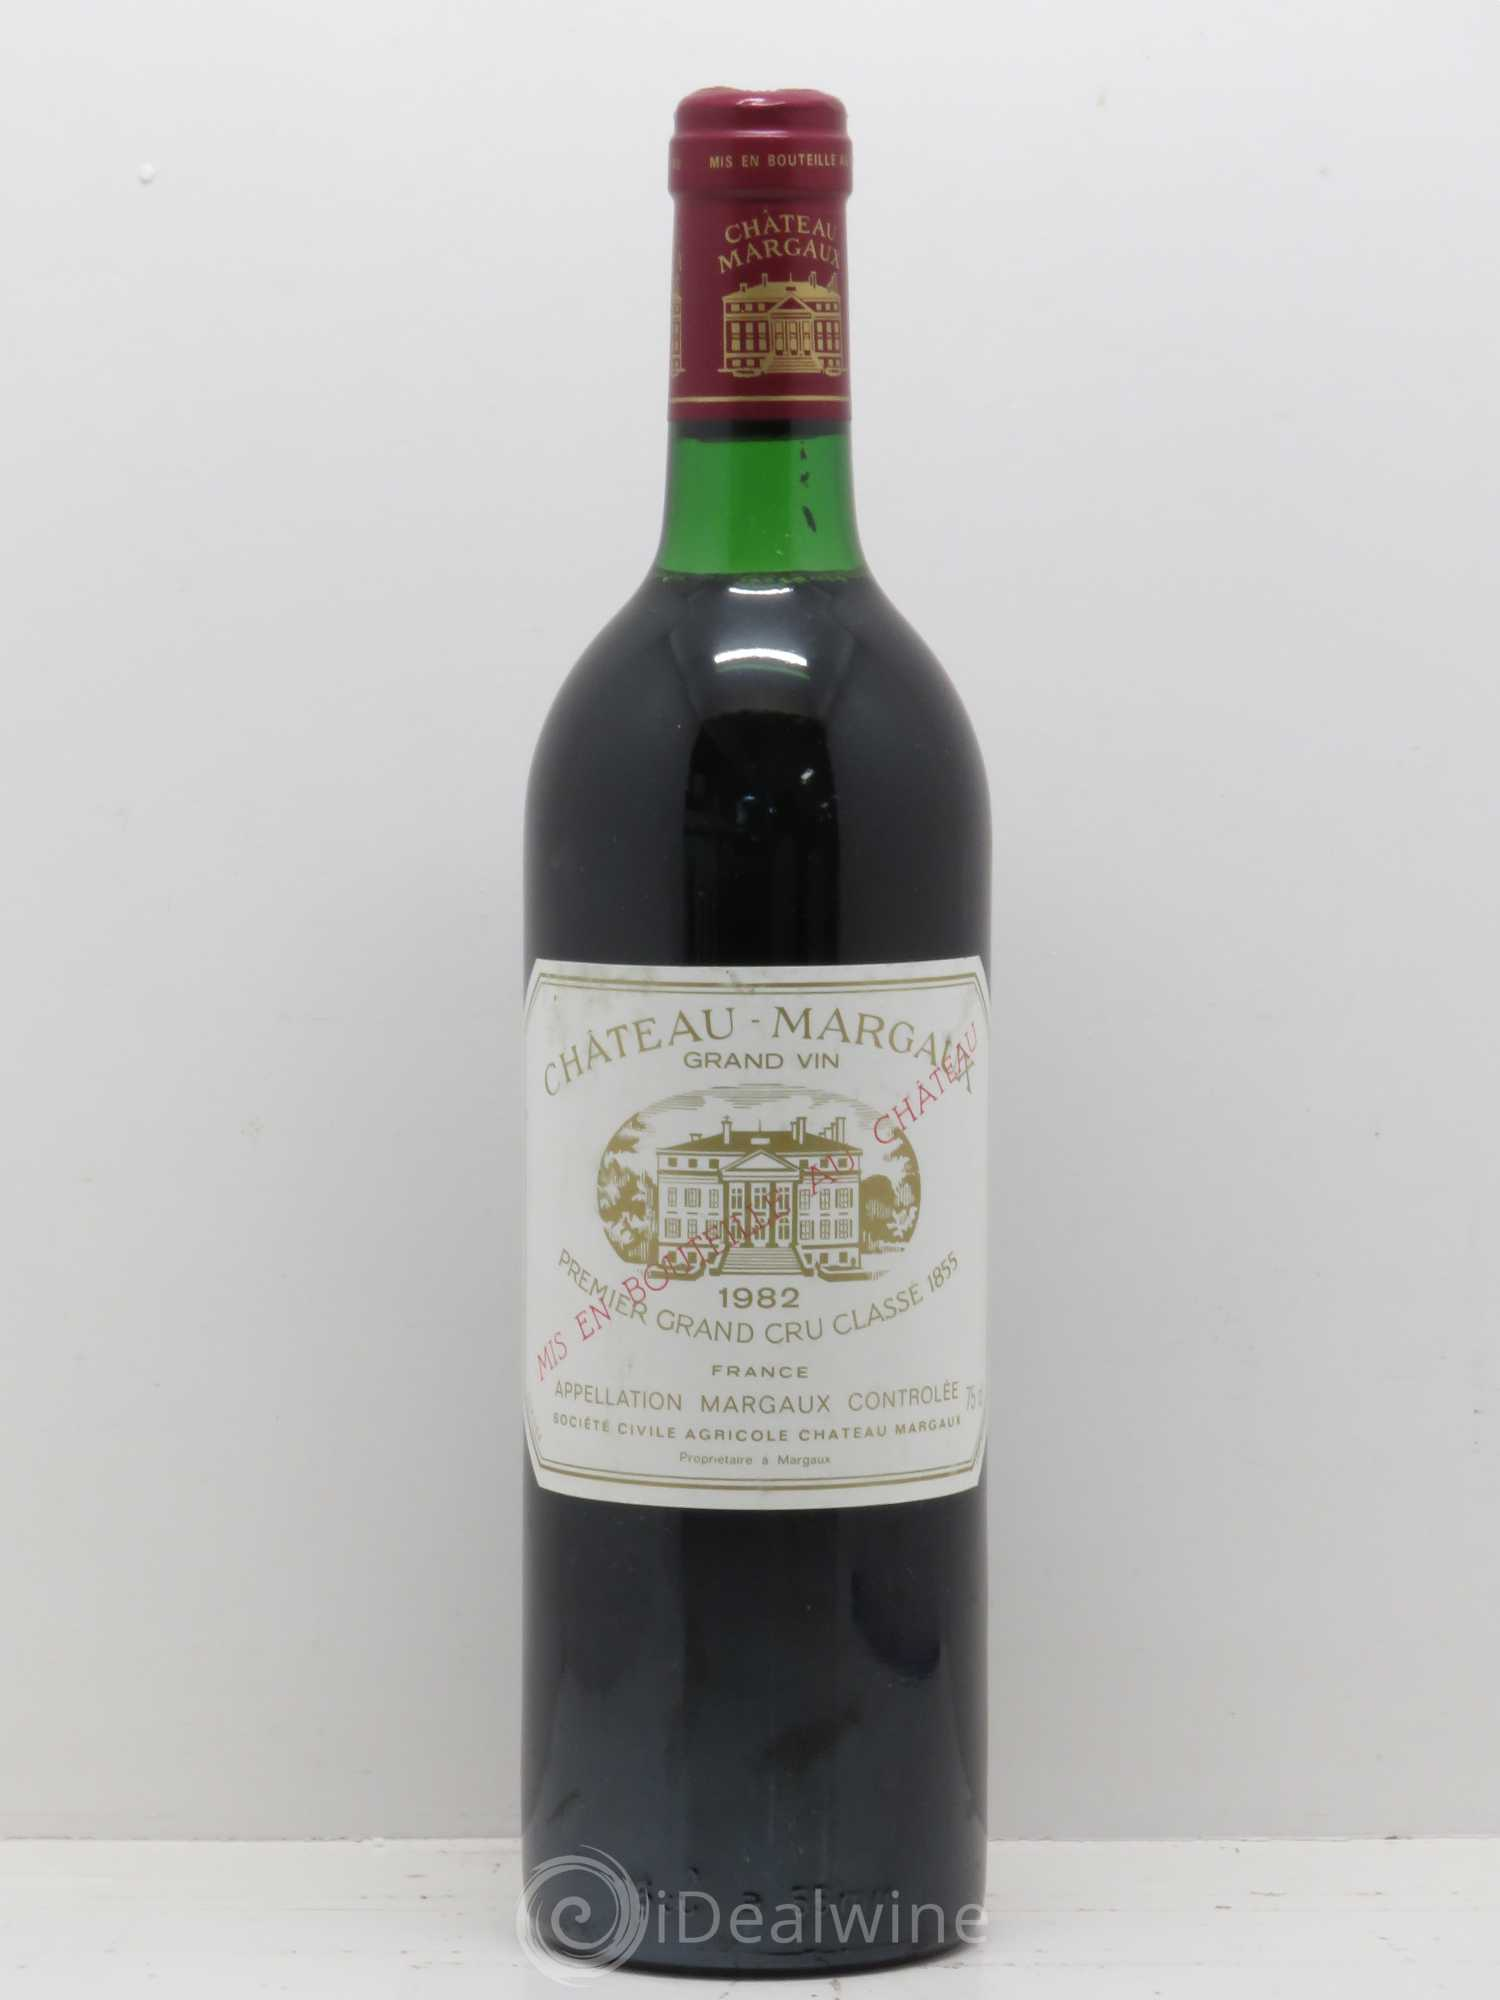 Buy ch teau margaux 1er grand cru class 1982 lot 10074 for Chateau margaux